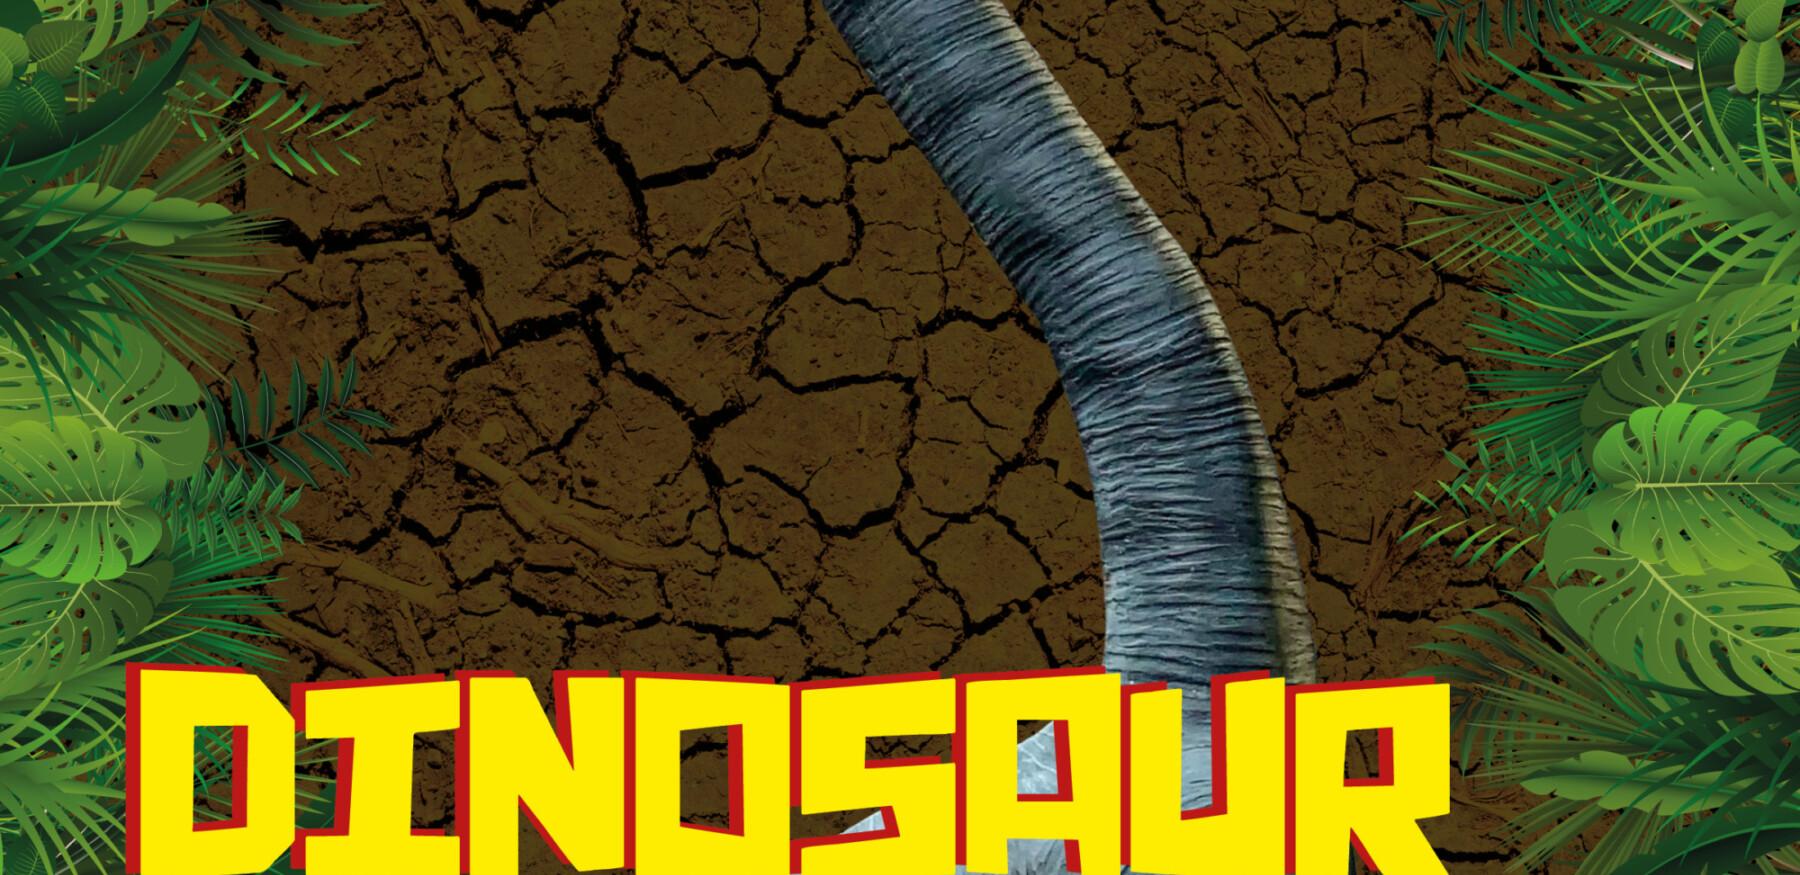 Dino Event Graphics FB Image 5 Dino Crafts 1200x1200